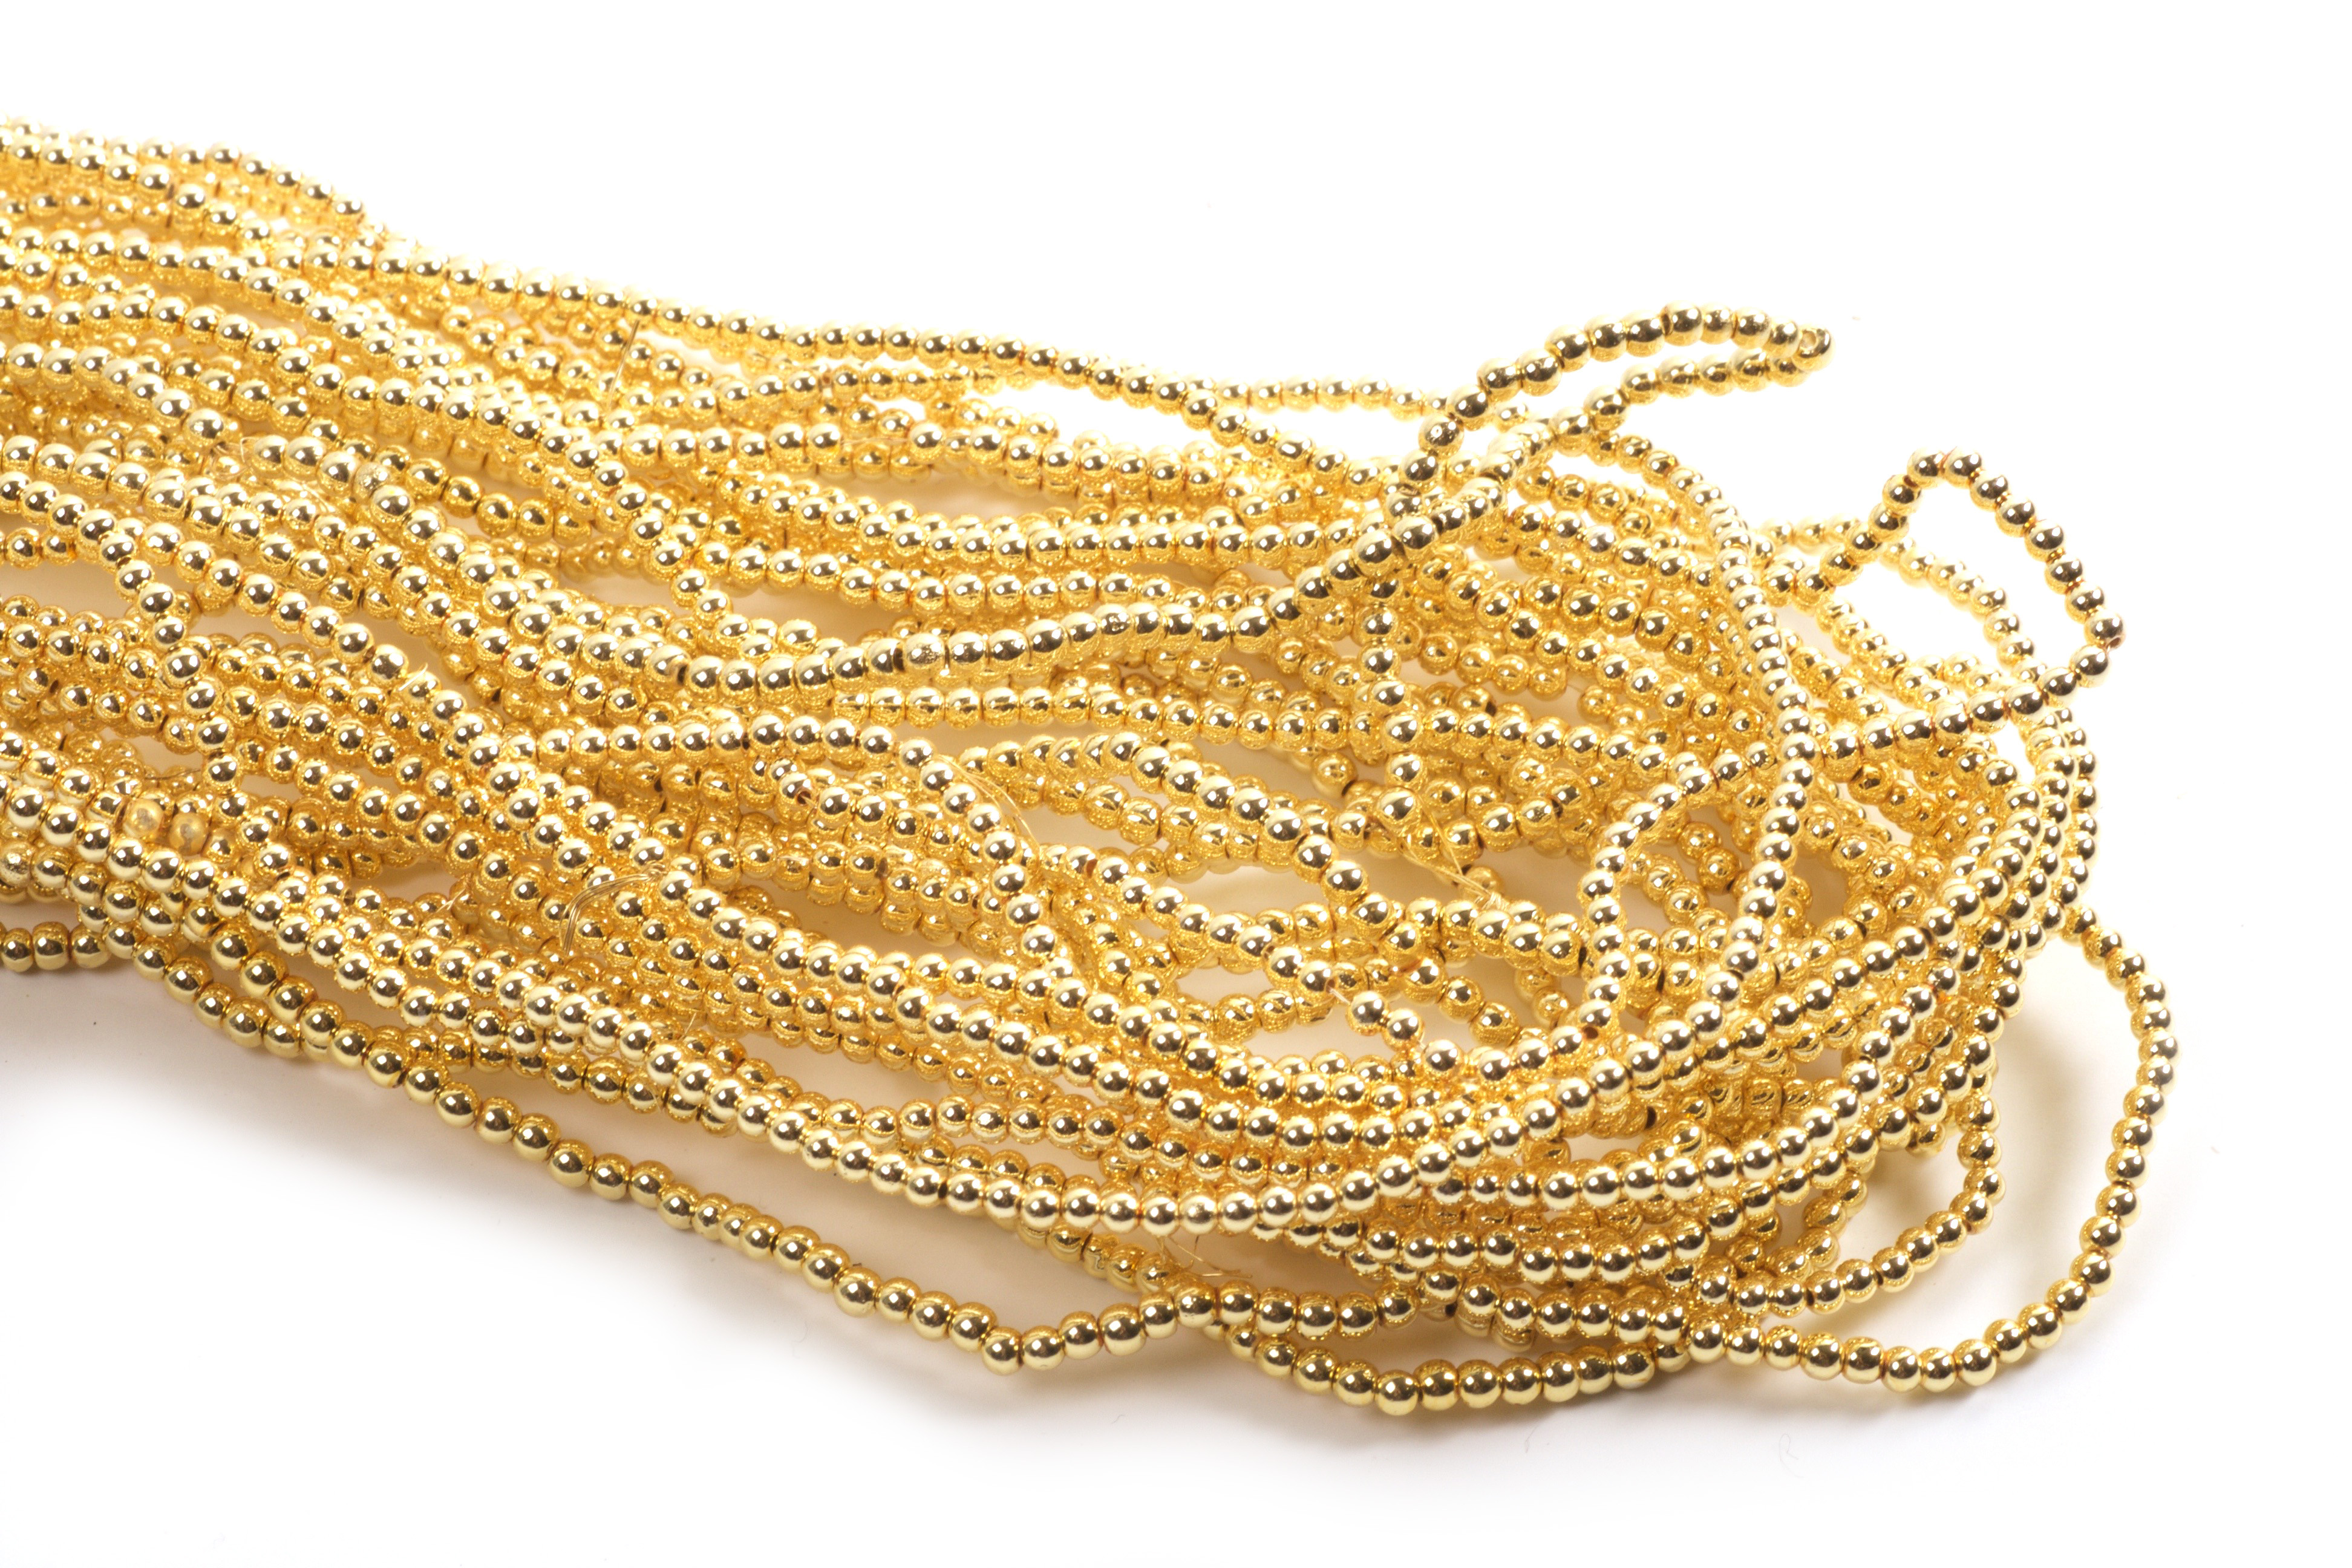 Hæmatit, rund, guldfarvet, 2 mm, 1 streng